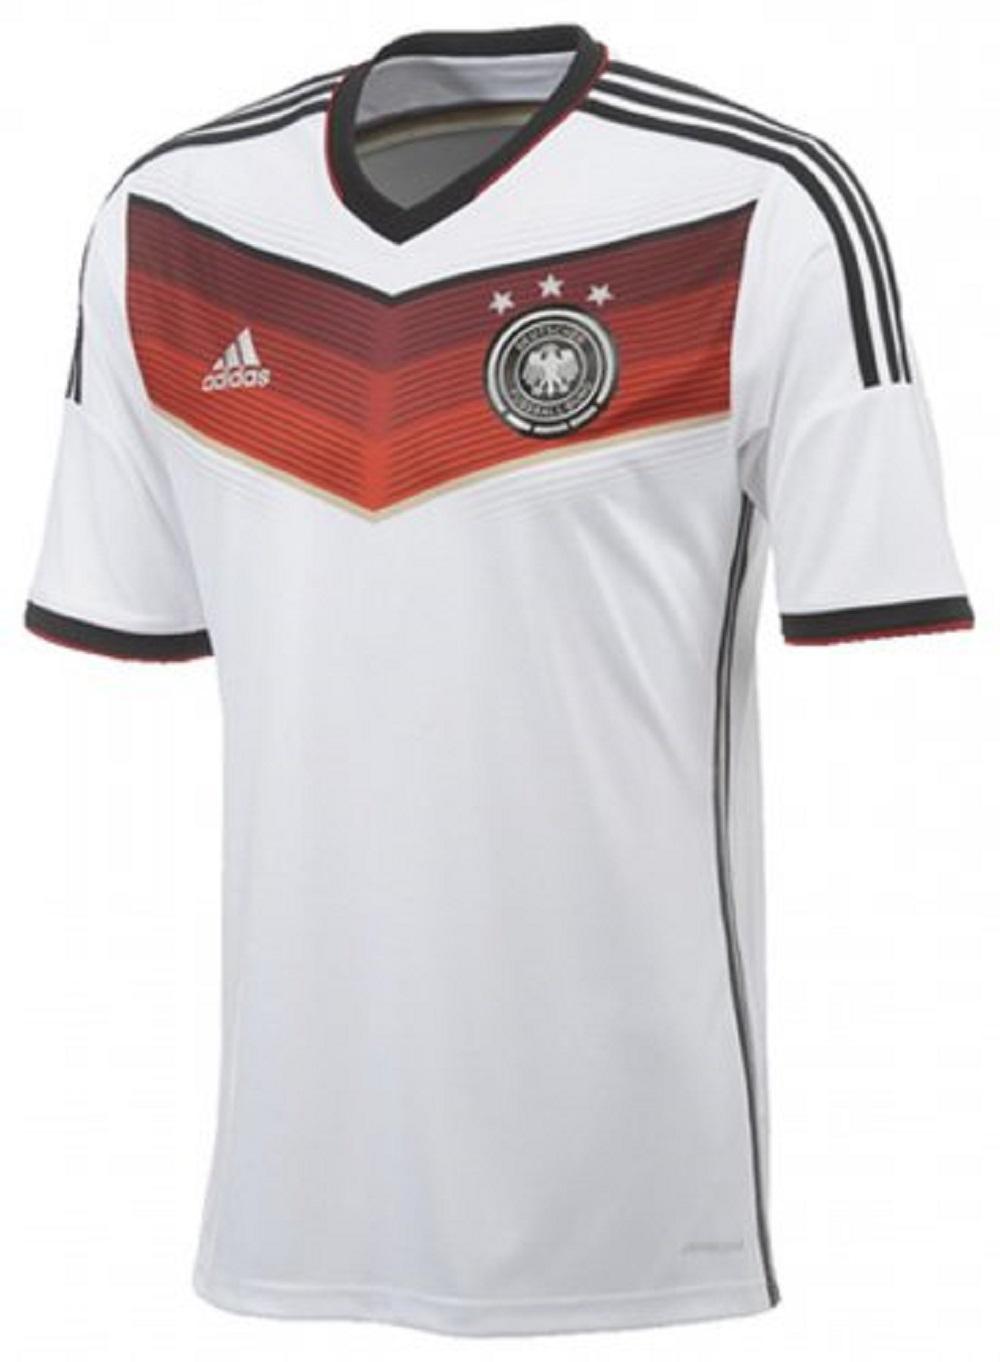 adidas dfb deutschland trikot home kinder wm 2014 fantrikots fanshop nationalmannschaften. Black Bedroom Furniture Sets. Home Design Ideas